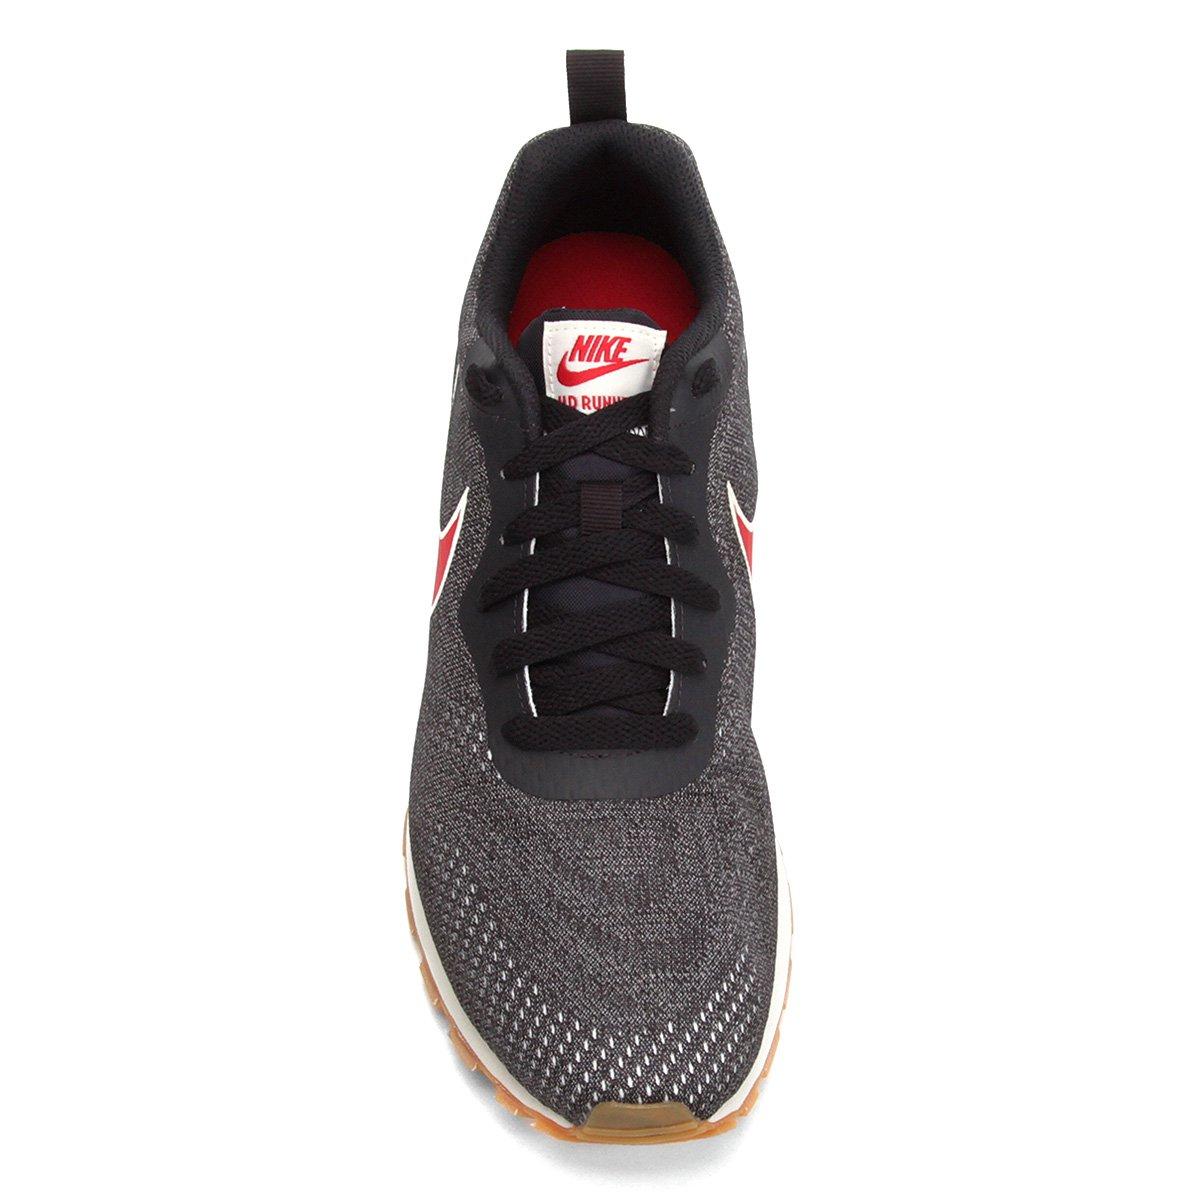 Tênis Nike Md Runner 2 Eng Mesh Masculino Preto e Vermelho